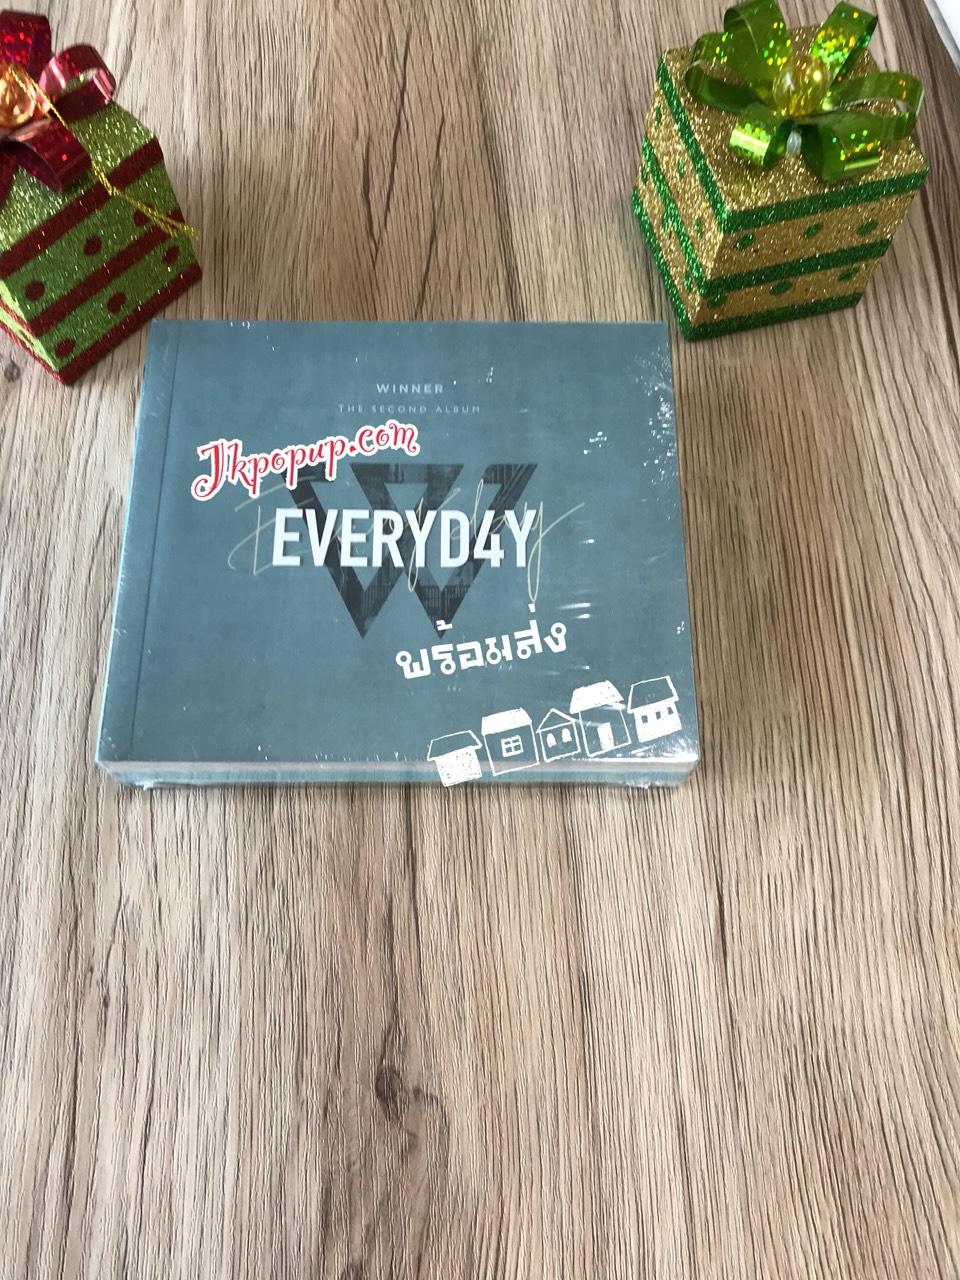 WINNER - Album Vol.2 [EVERYD4Y] หน้าปก DAY Ver. + โปสเตอร์ พร้อมกระบอกโปสเตอร์ พร้อมส่ง